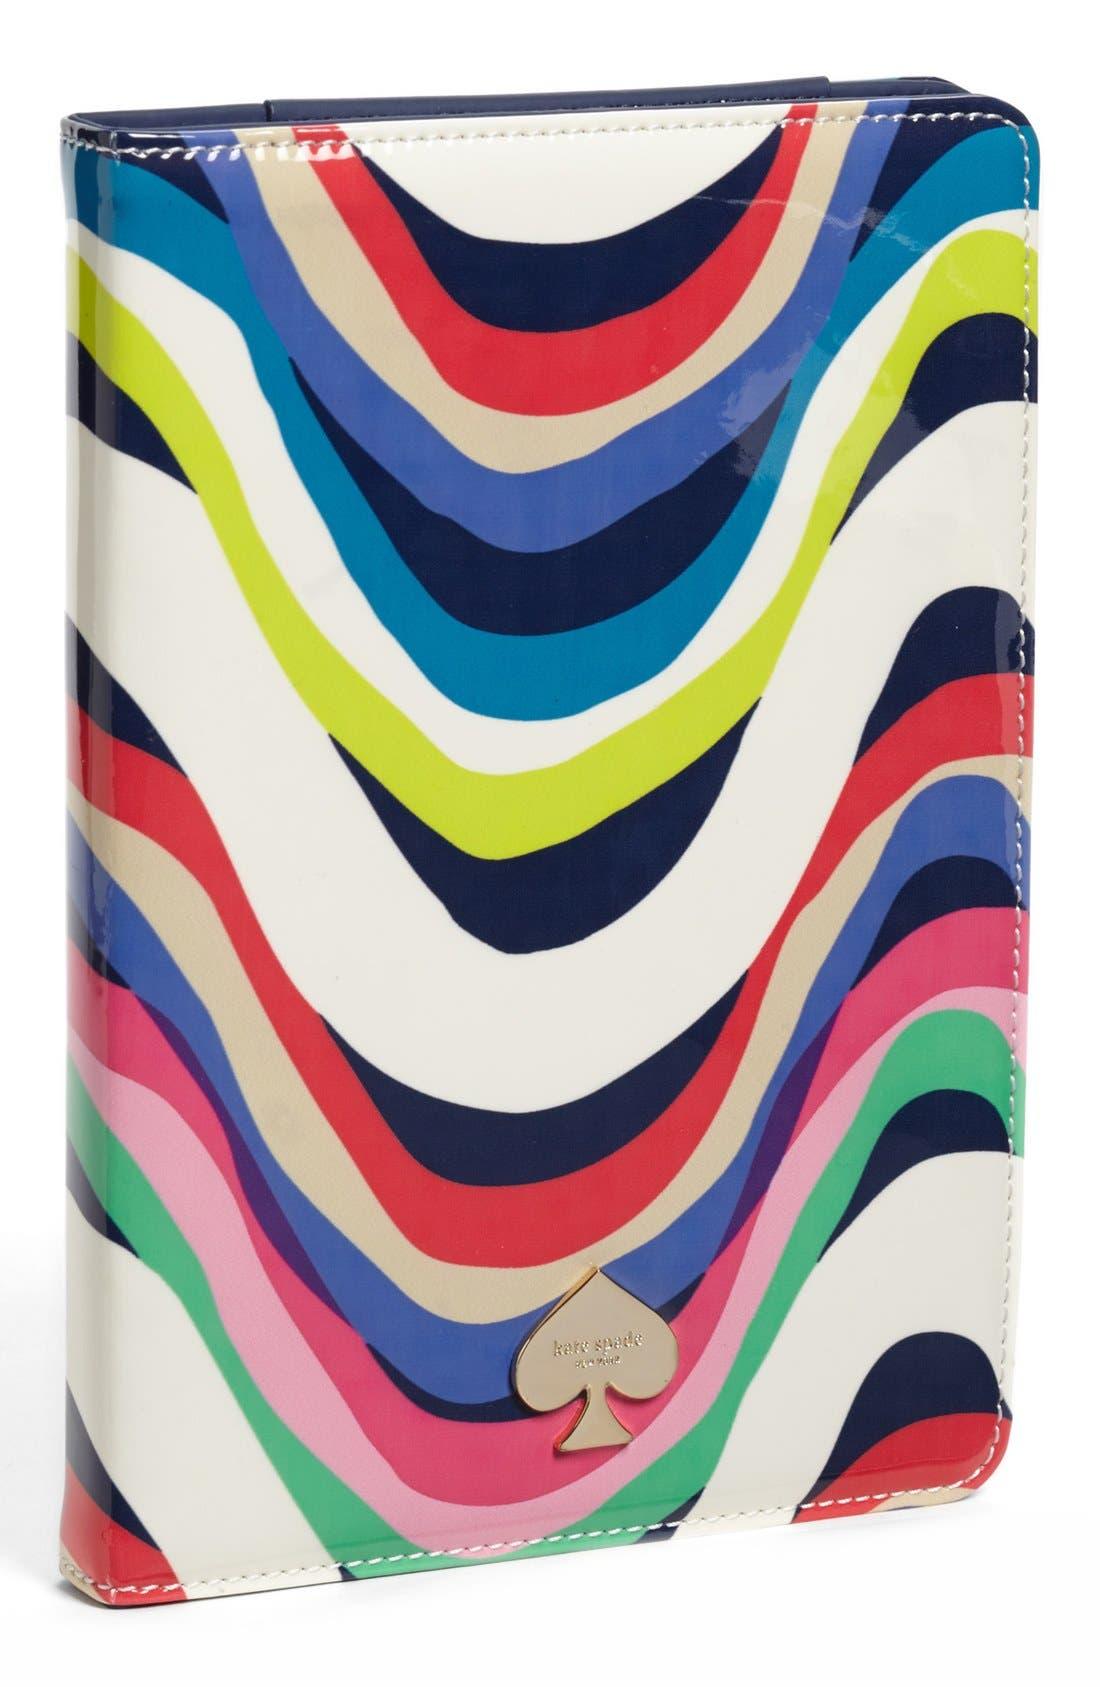 Alternate Image 1 Selected - kate spade new york 'brighton wave' iPad mini folio